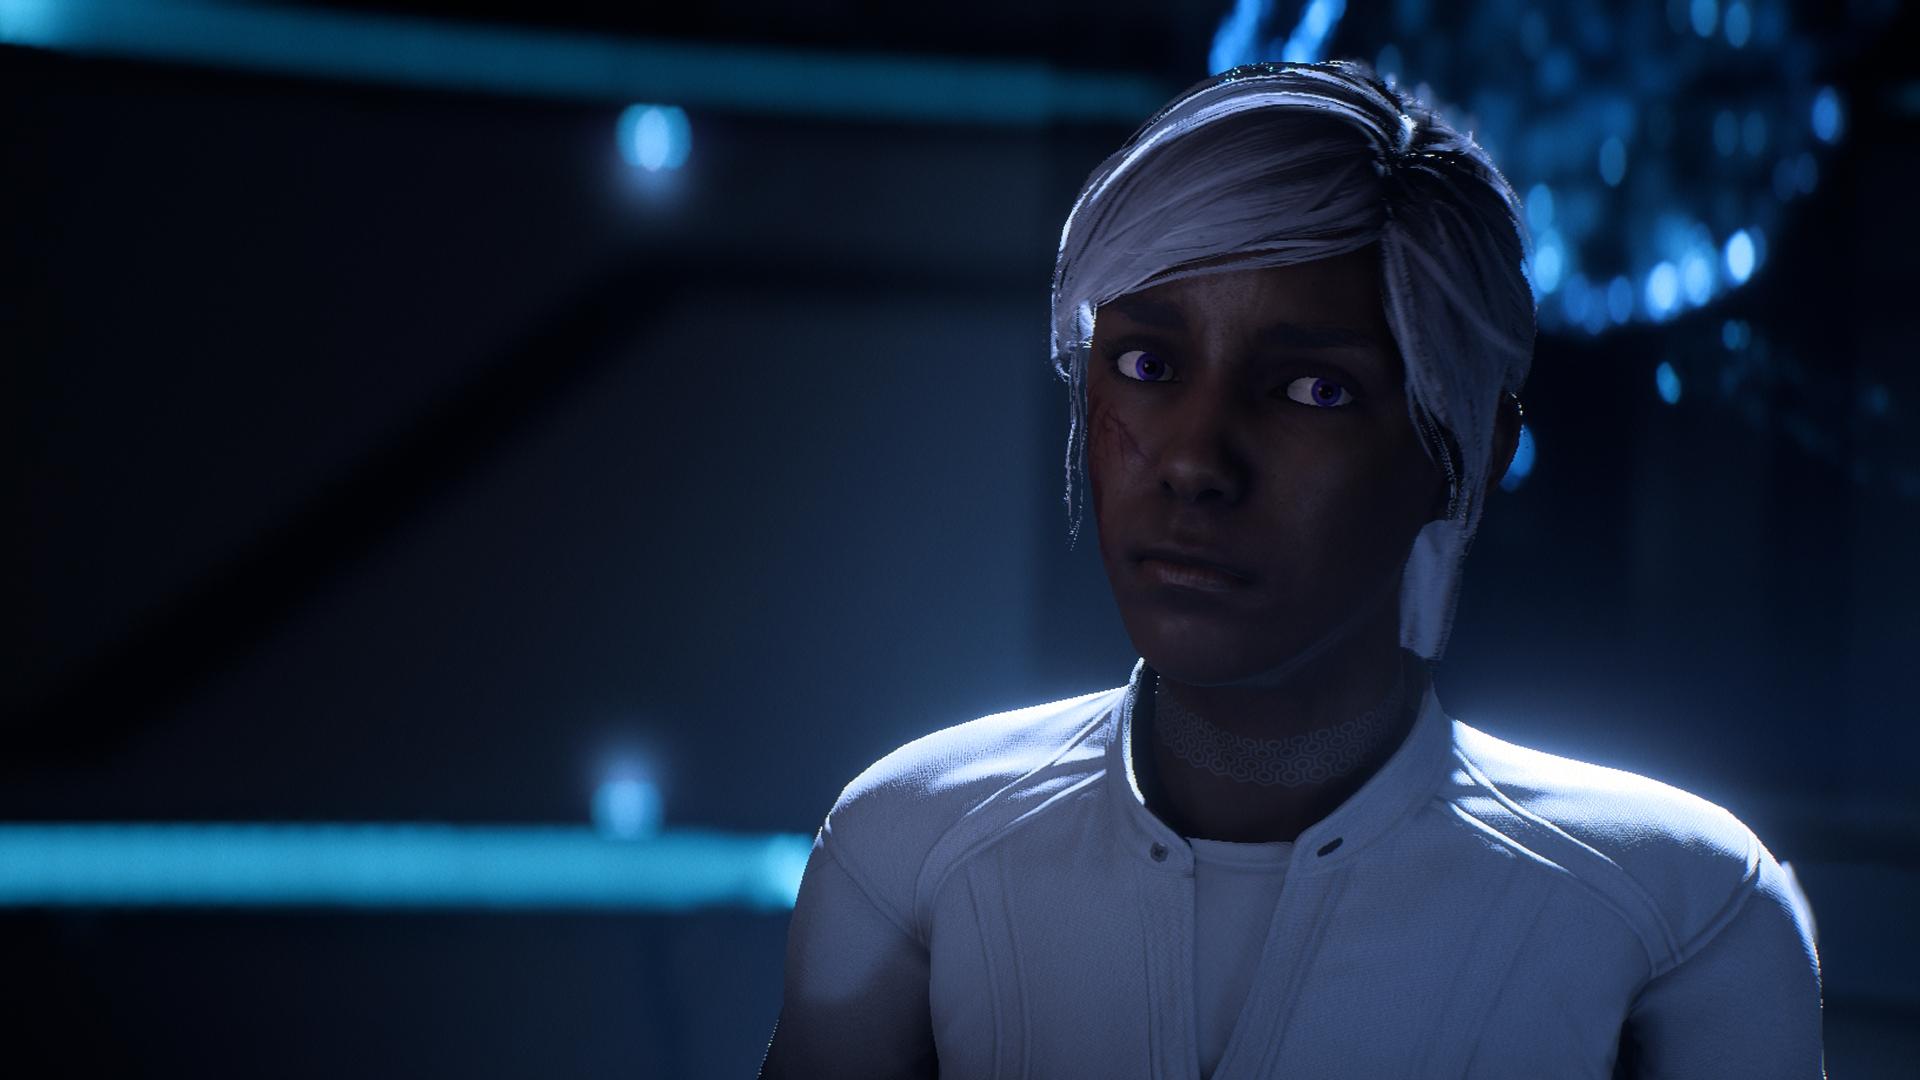 MassEffectAndromeda 2017-04-10 01-37-44-068.jpg - Mass Effect: Andromeda